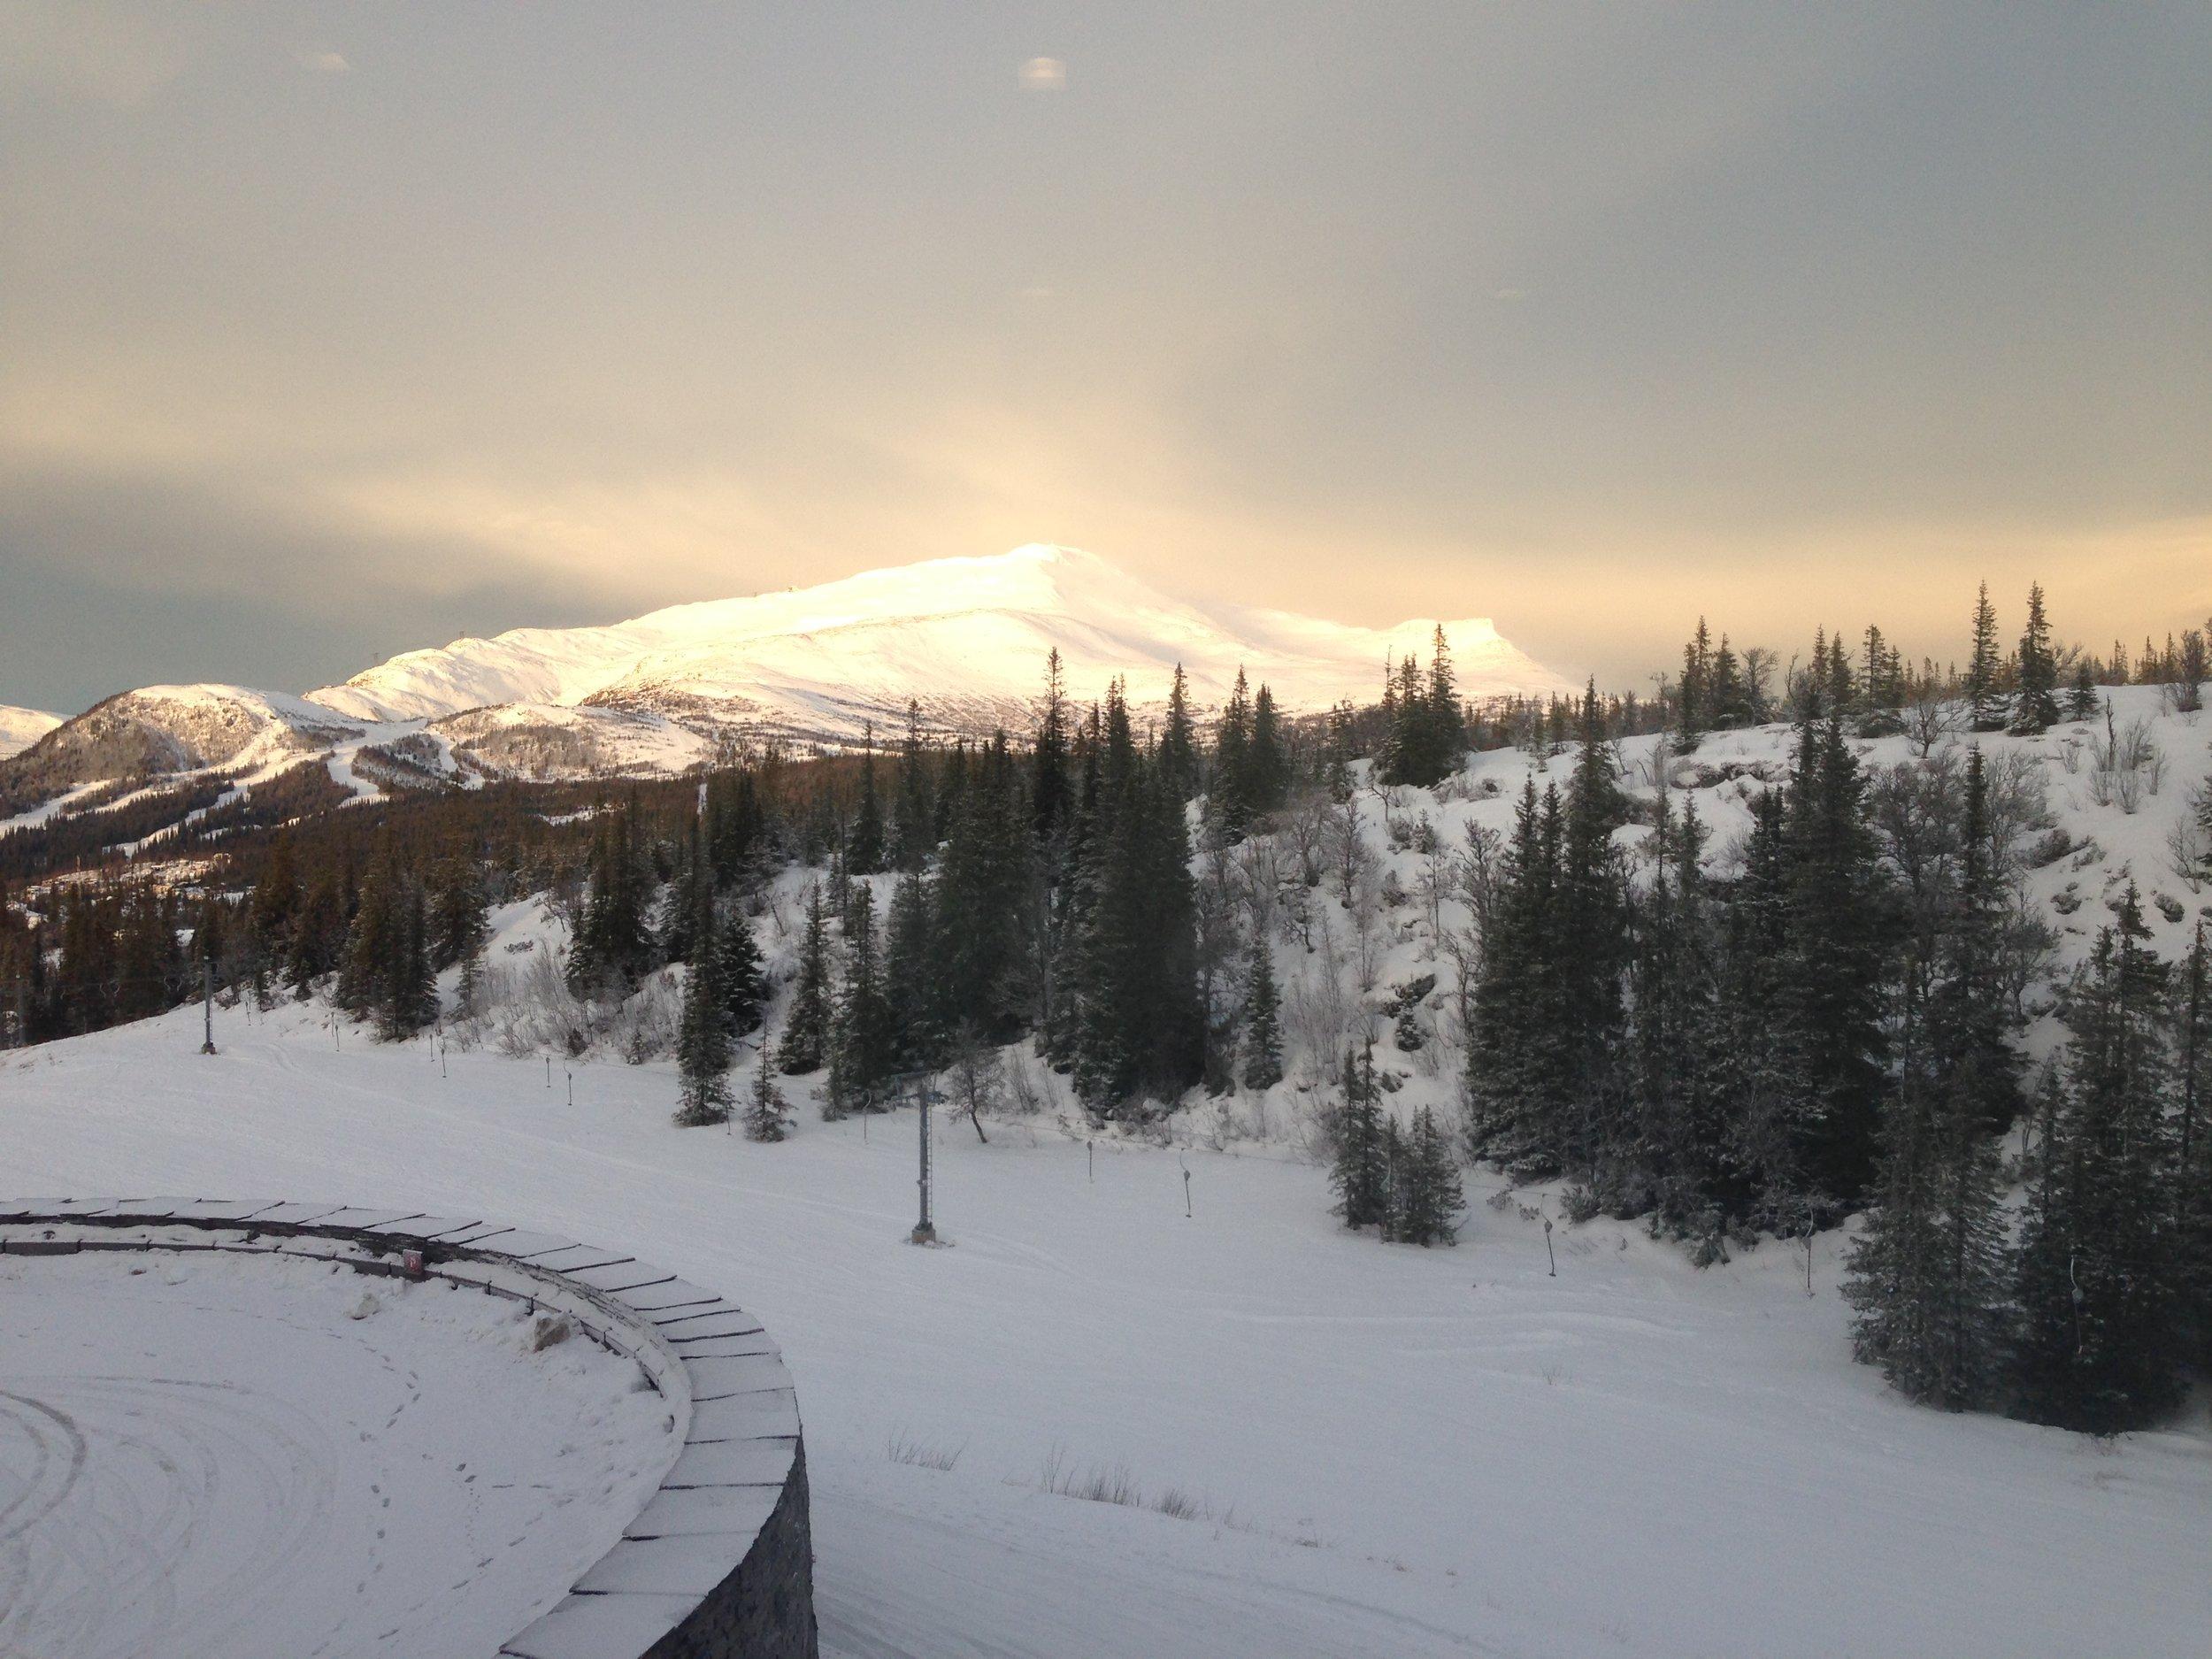 View to Åreskutan mountain from Copperhill Mountain Lodge